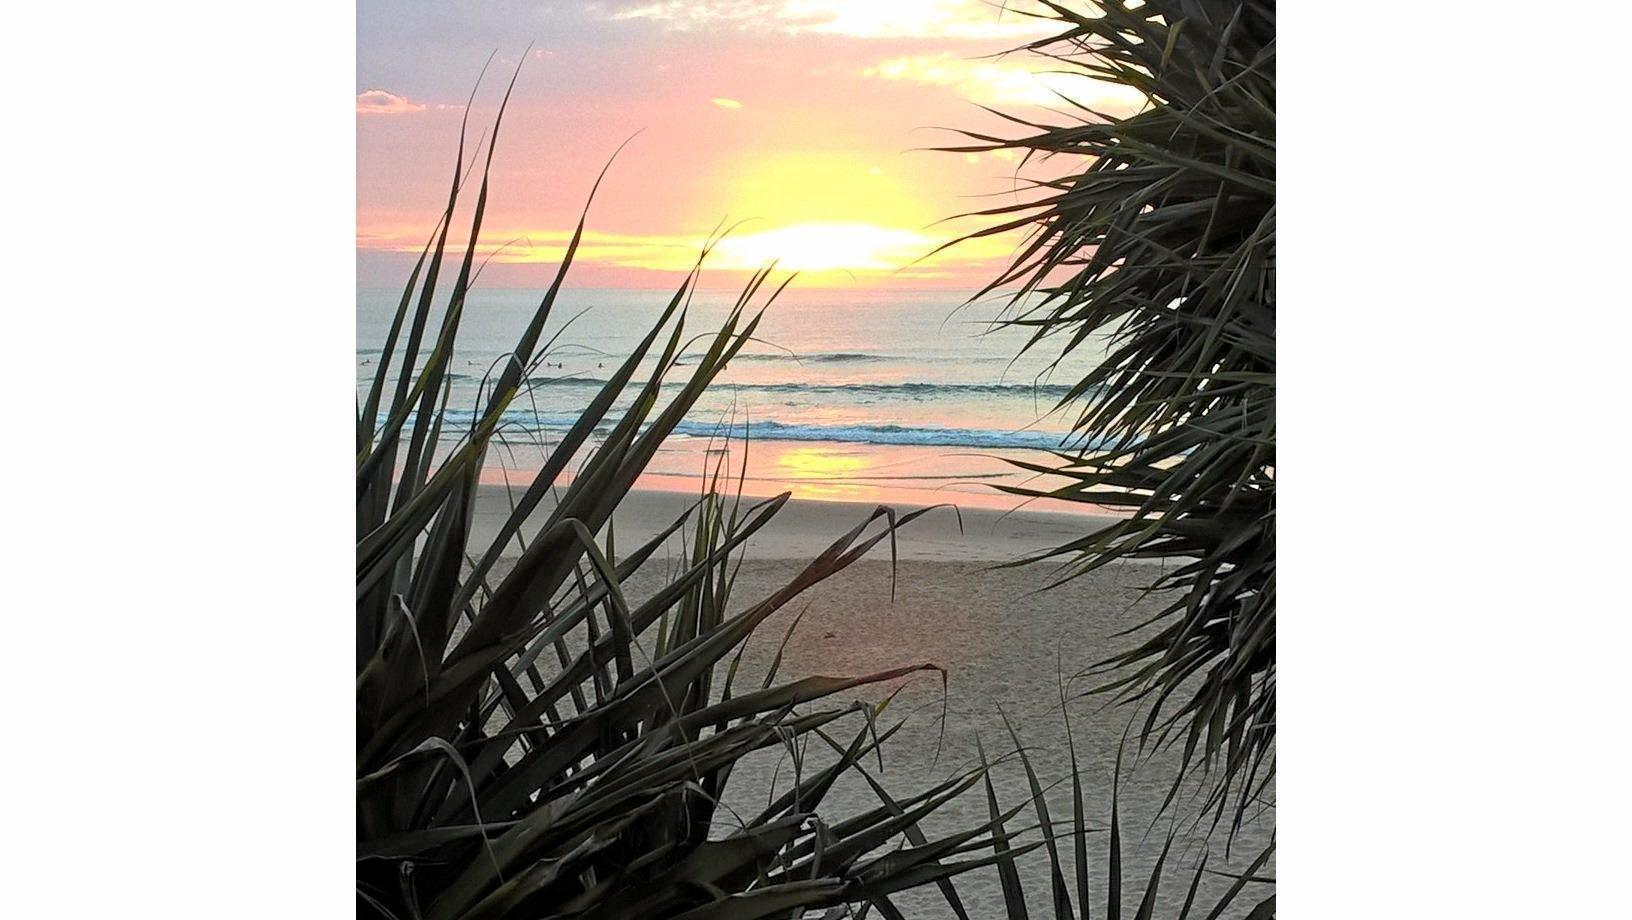 The sun continues to shine on the Sunshine Coast.